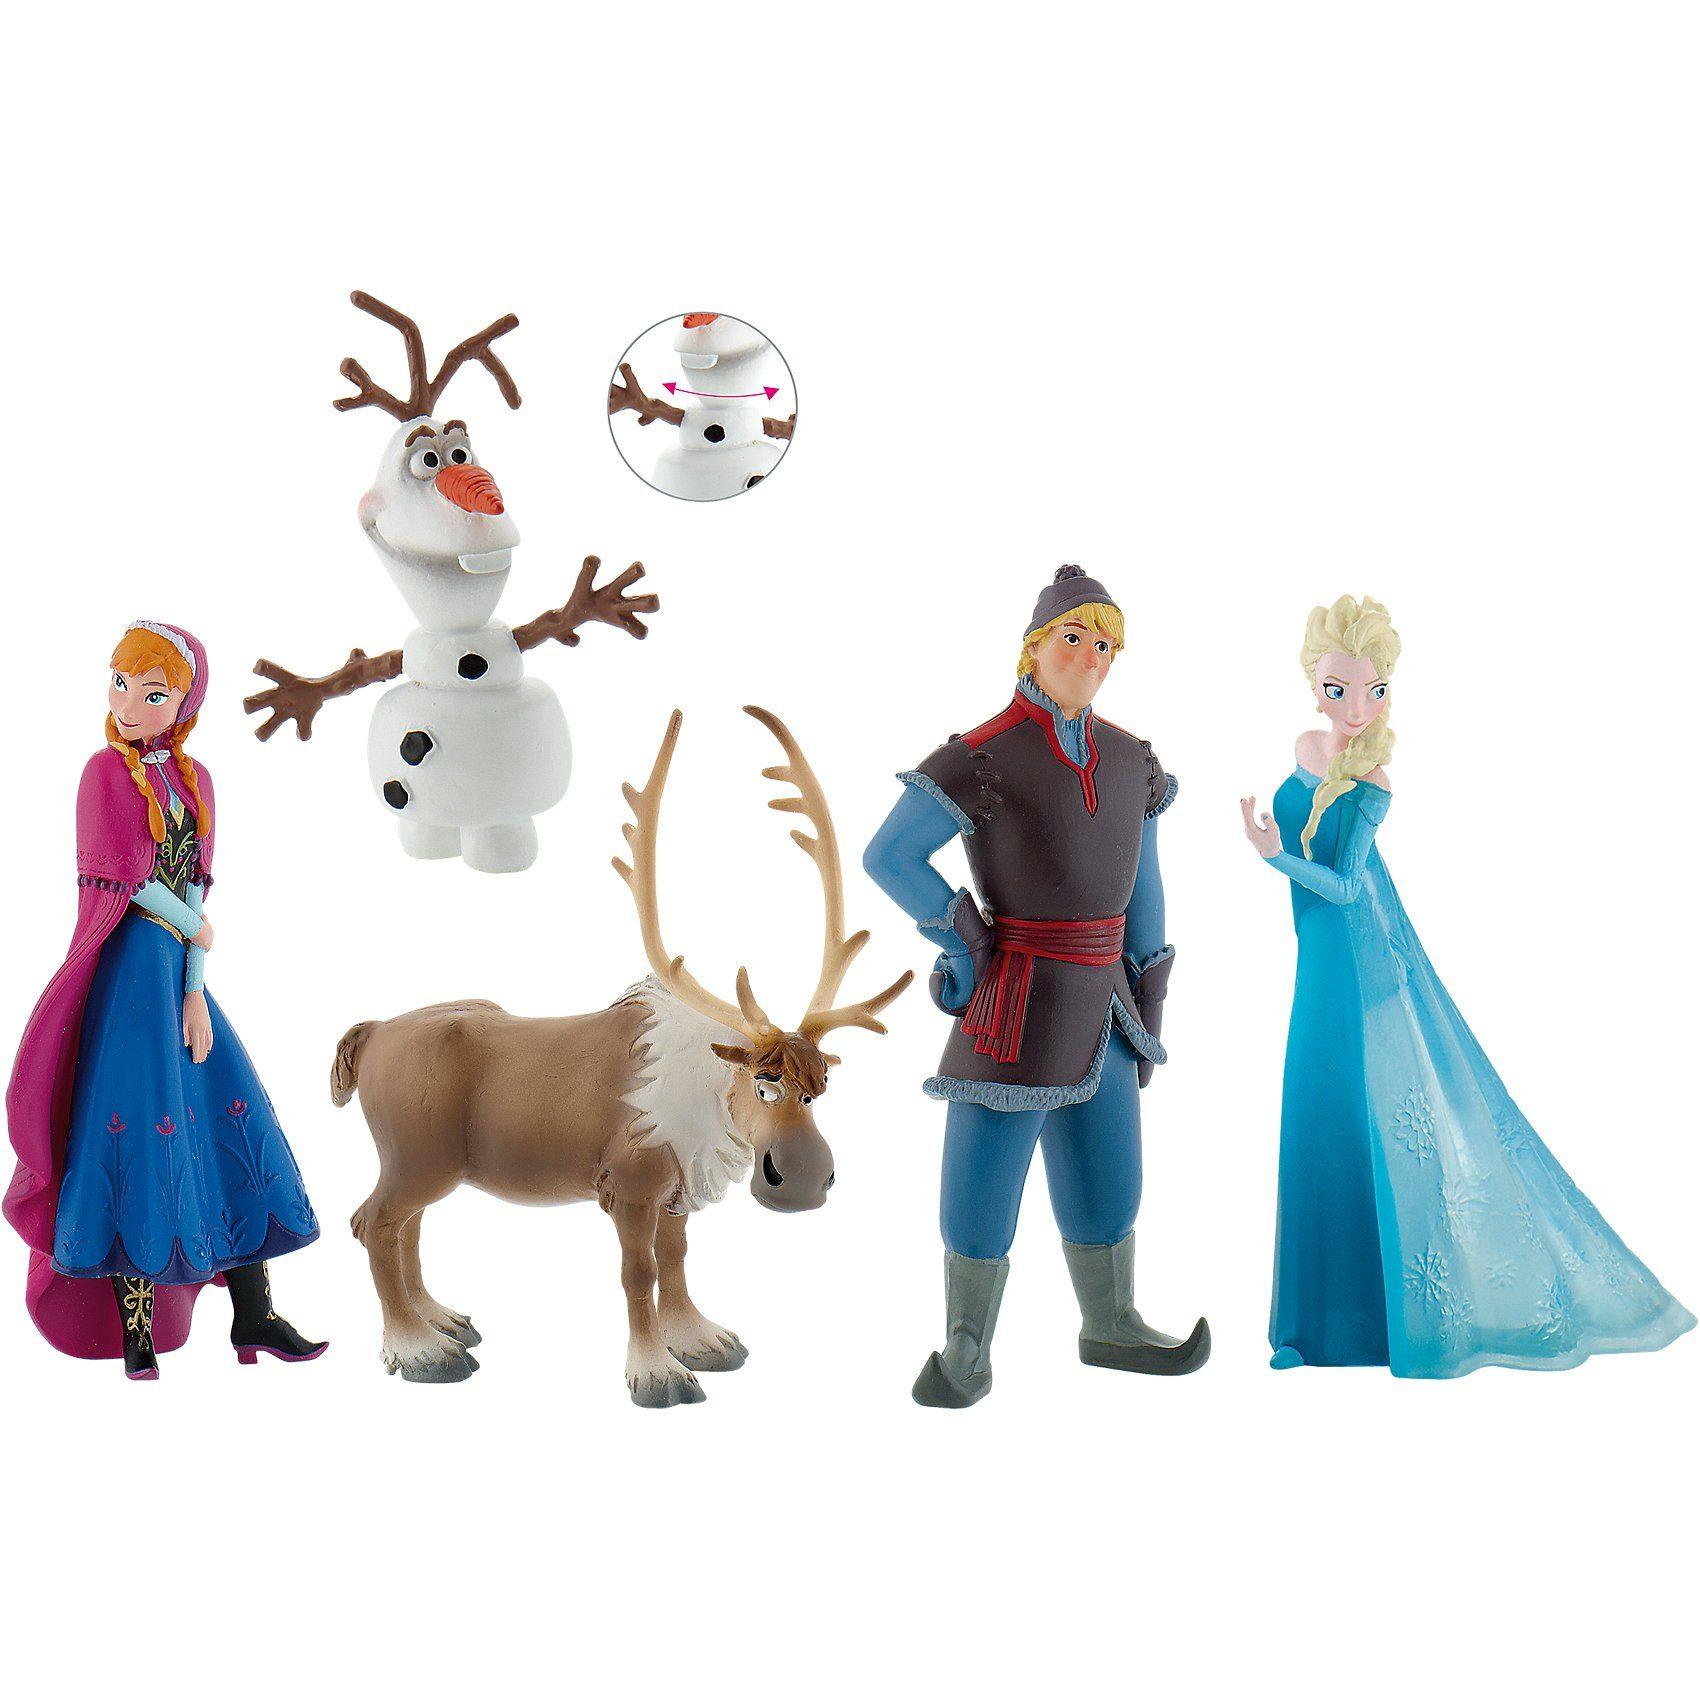 BULLYLAND Comicwelt - Walt Disney Die Eiskönigin Bumper Pack